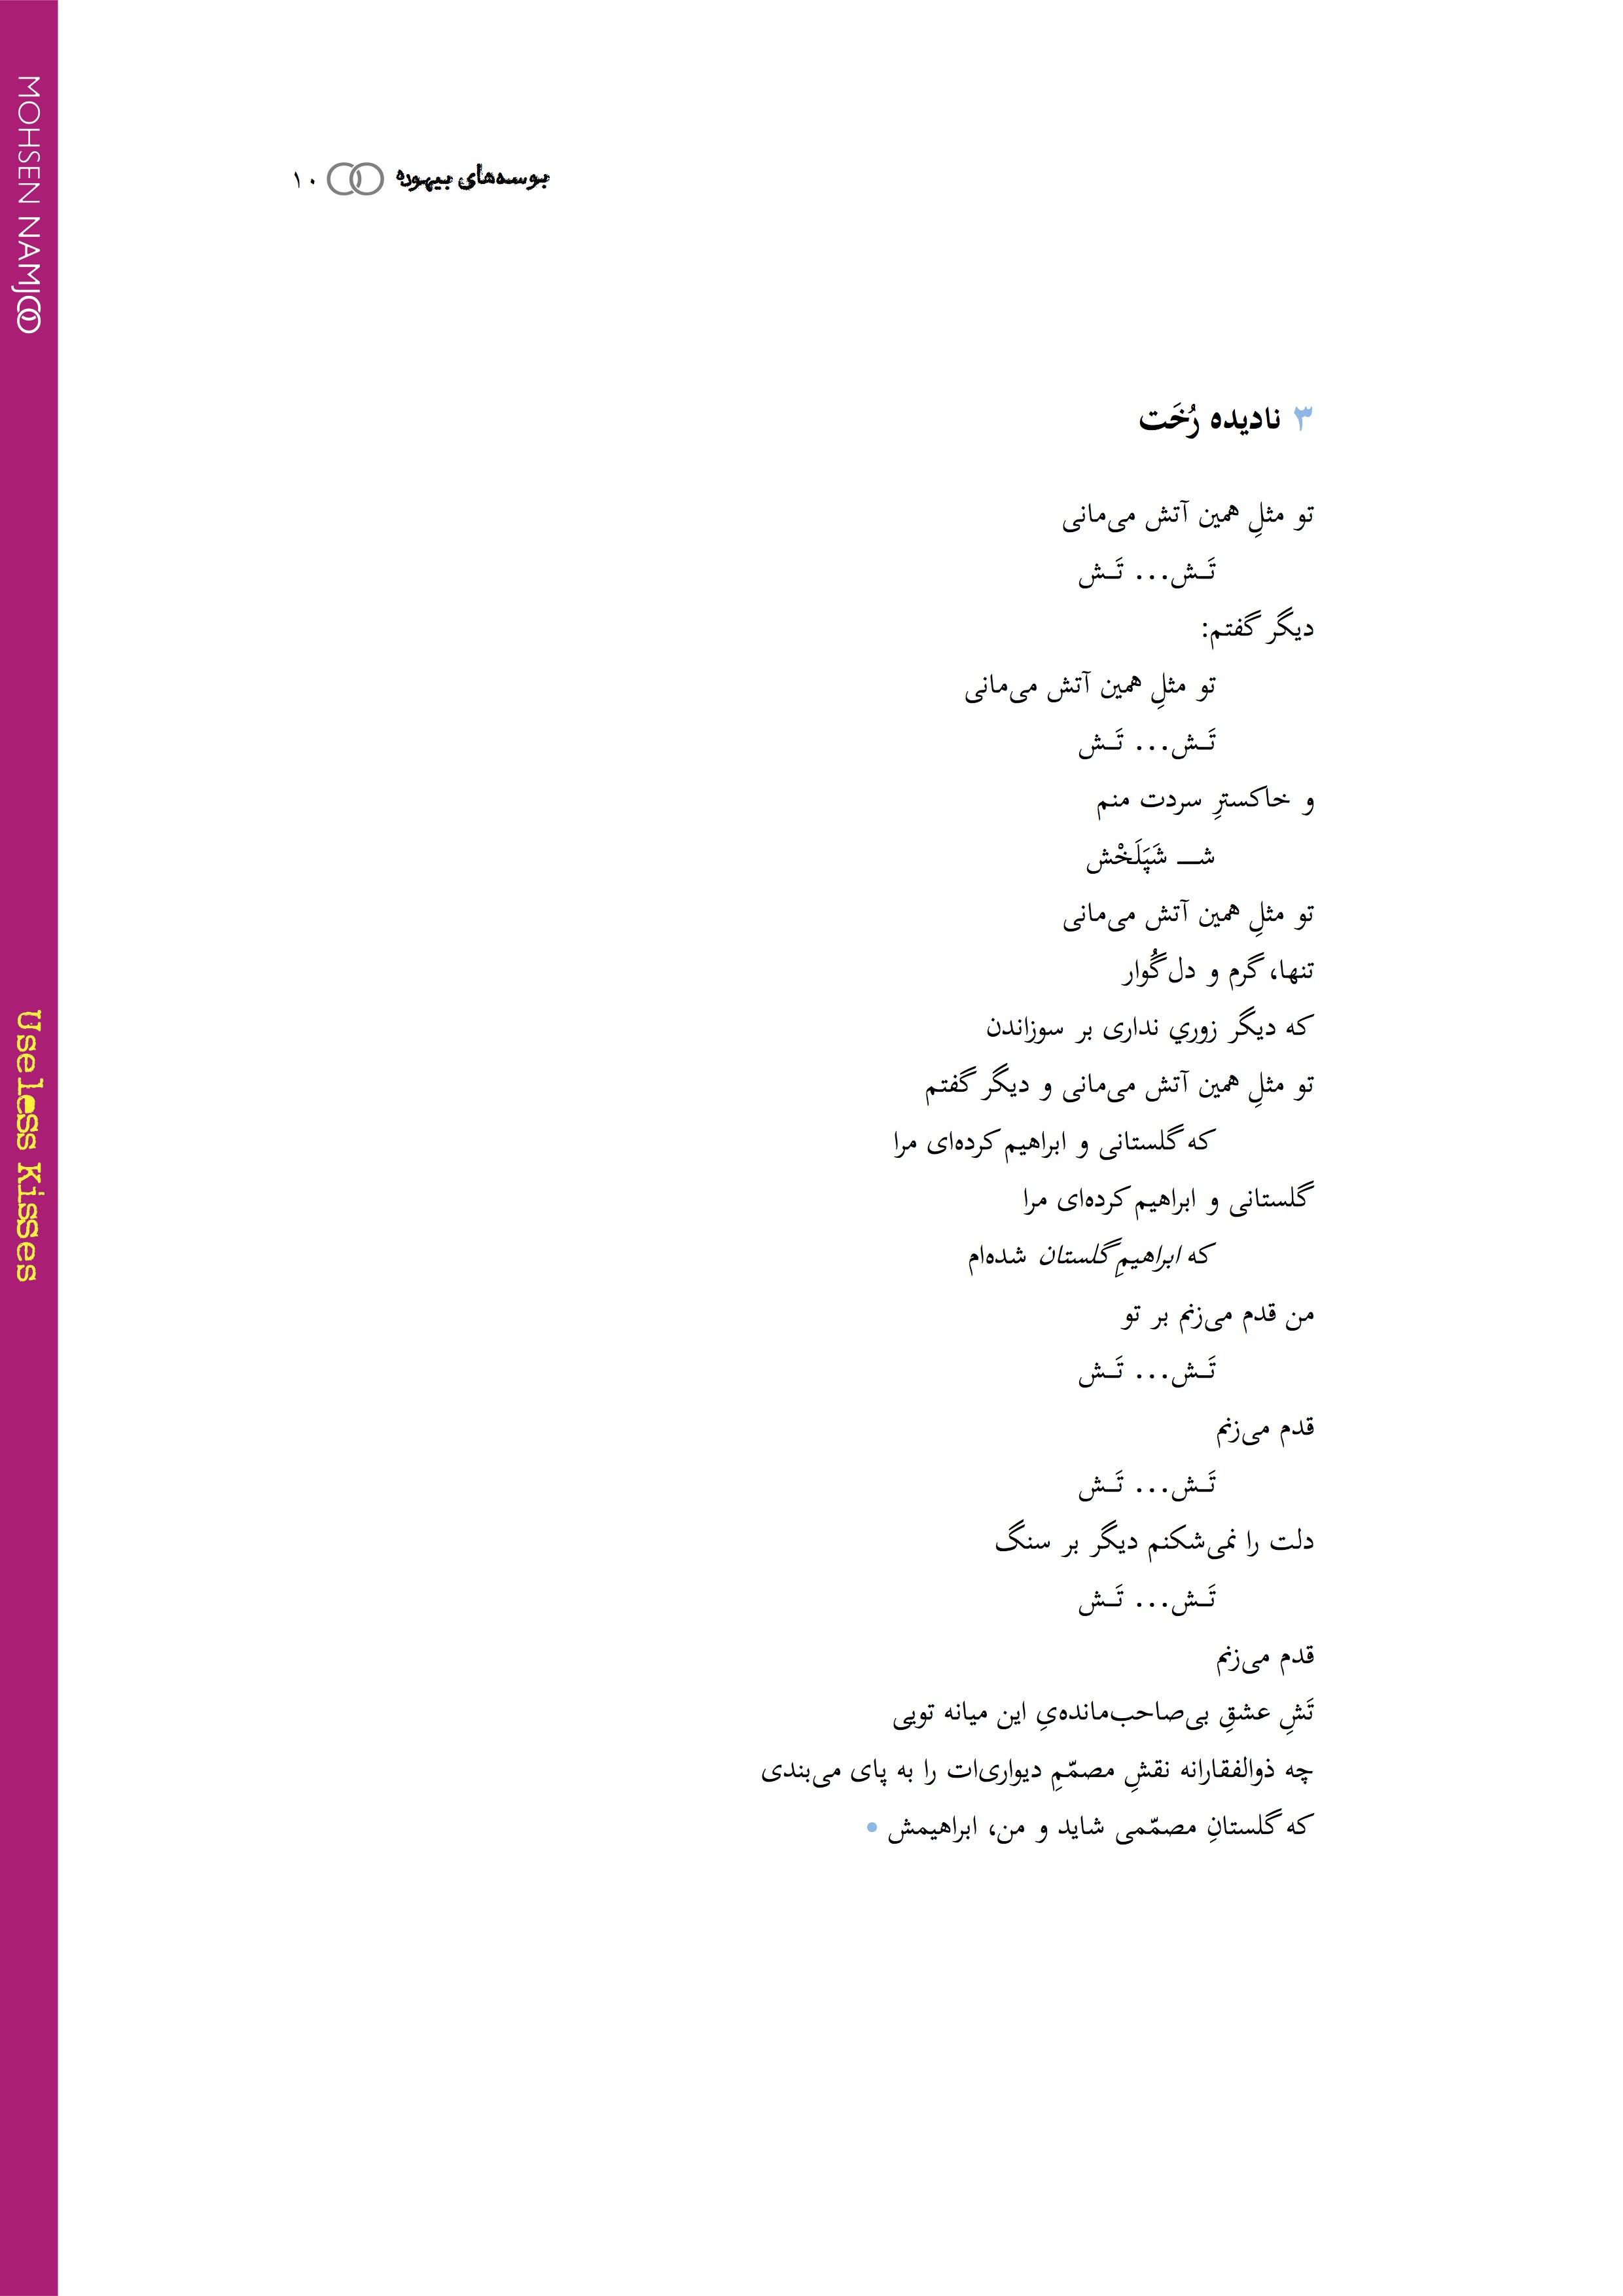 9Useless Kisses eBook (2nd Edition).jpg